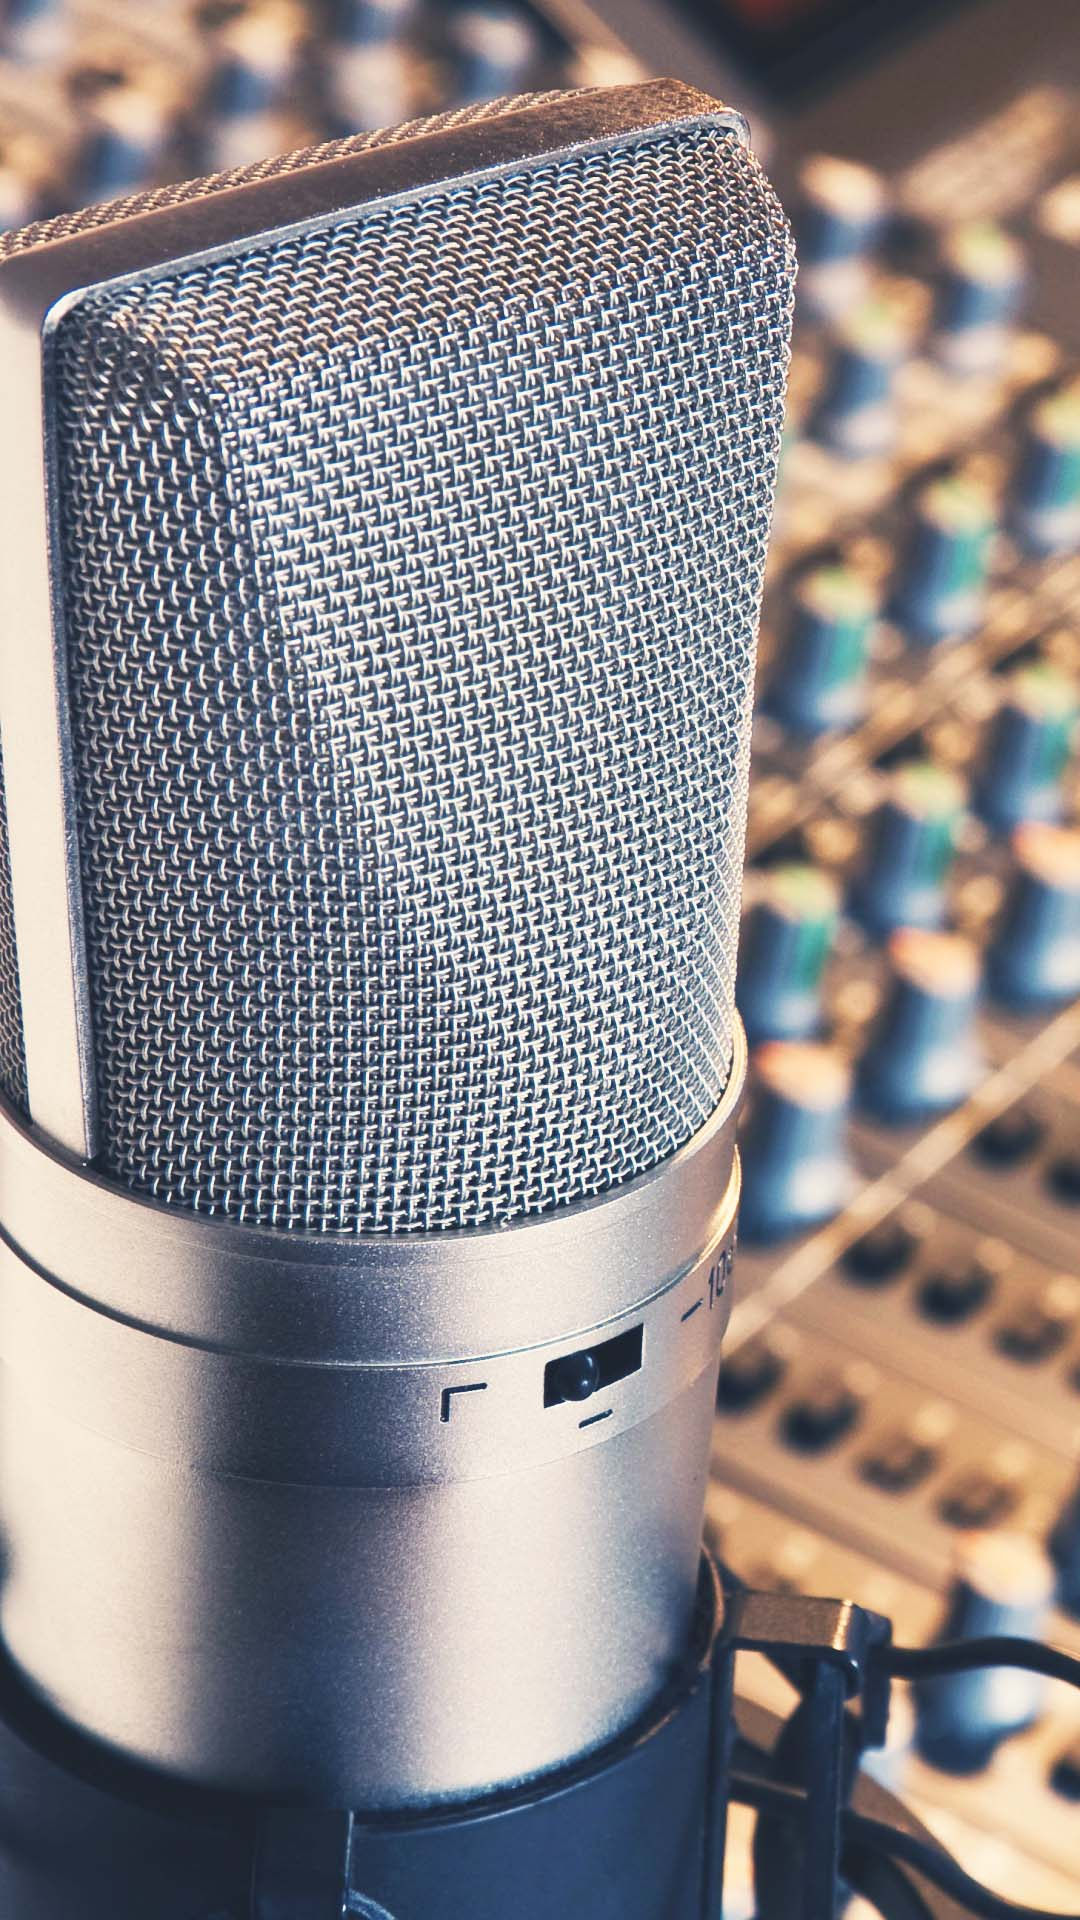 Htc One M8 Wallpaper Hd Studio Microphone Htc One Wallpaper